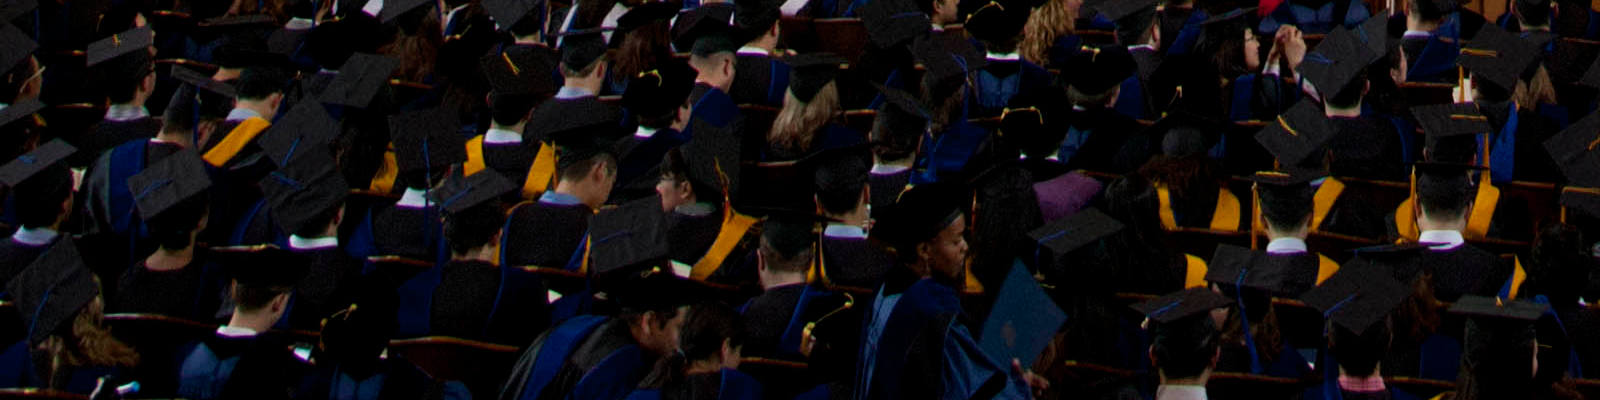 University Commencement & GSAS Diploma Ceremony - Monday Details ...